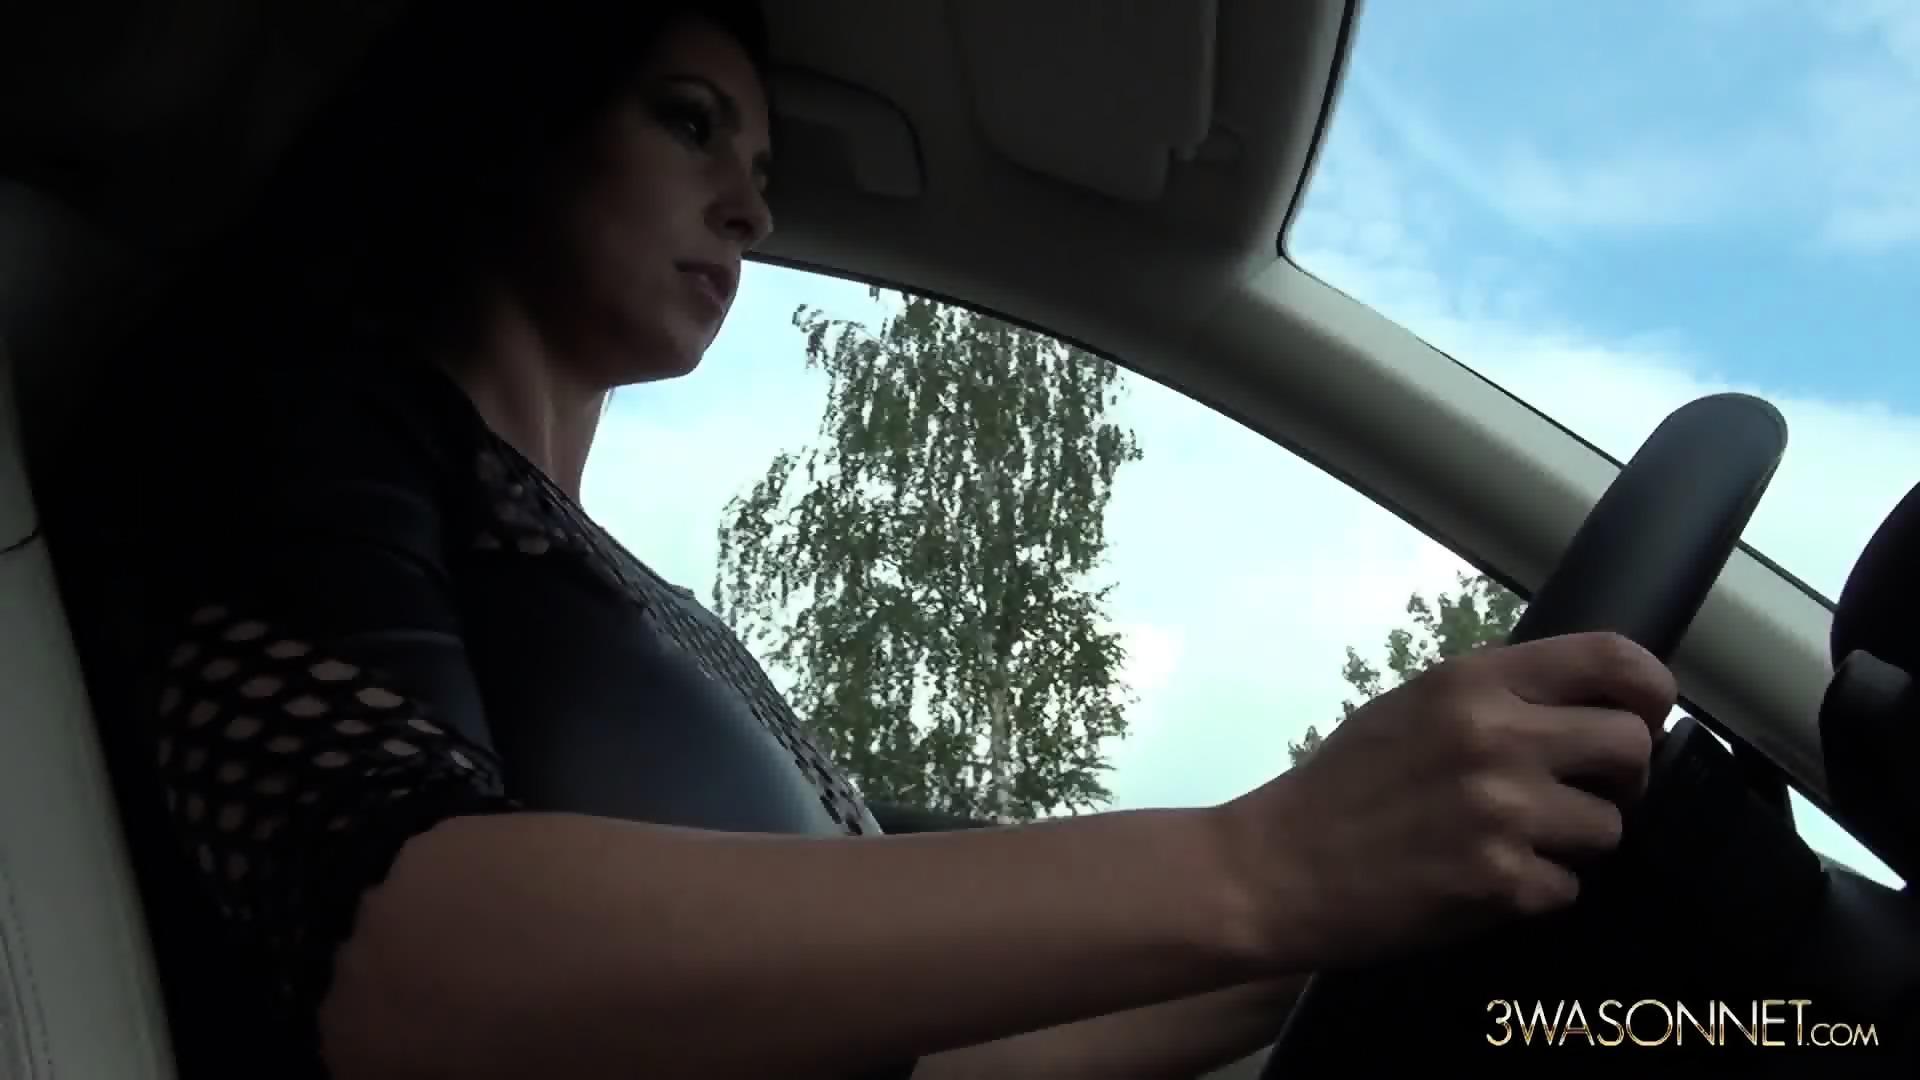 girls-ewa-sonnet-naked-car